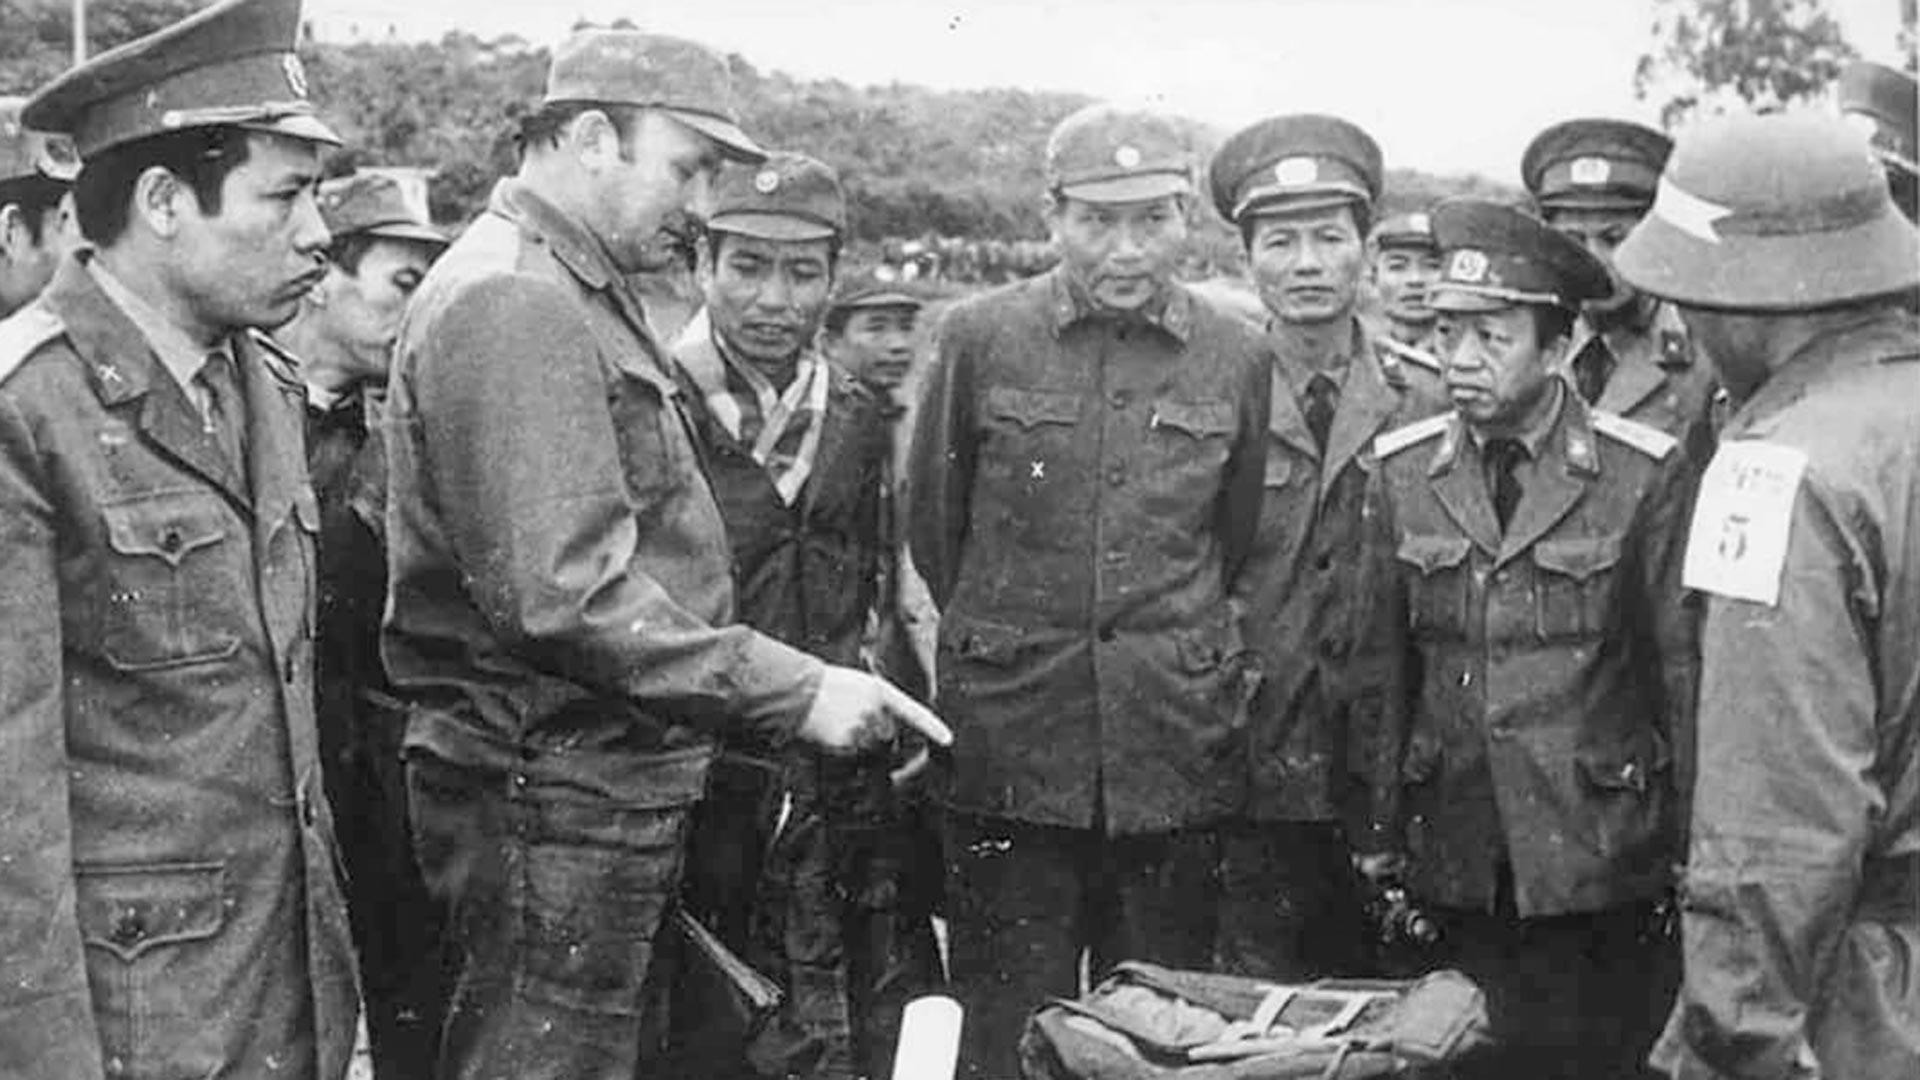 Military drills in Vietnam.